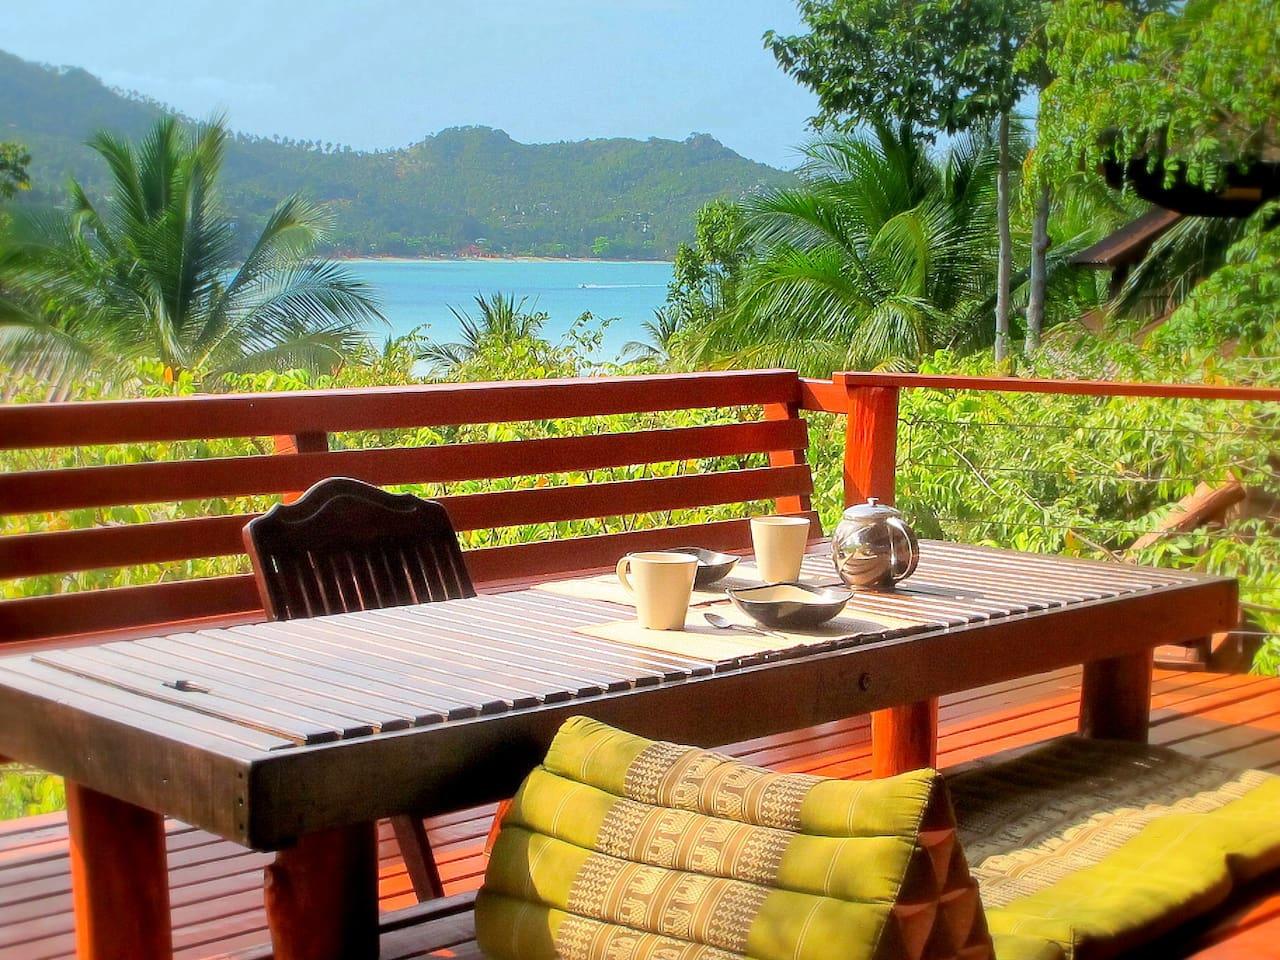 Enjoy breakfast on the verandah with mountain and sea views.